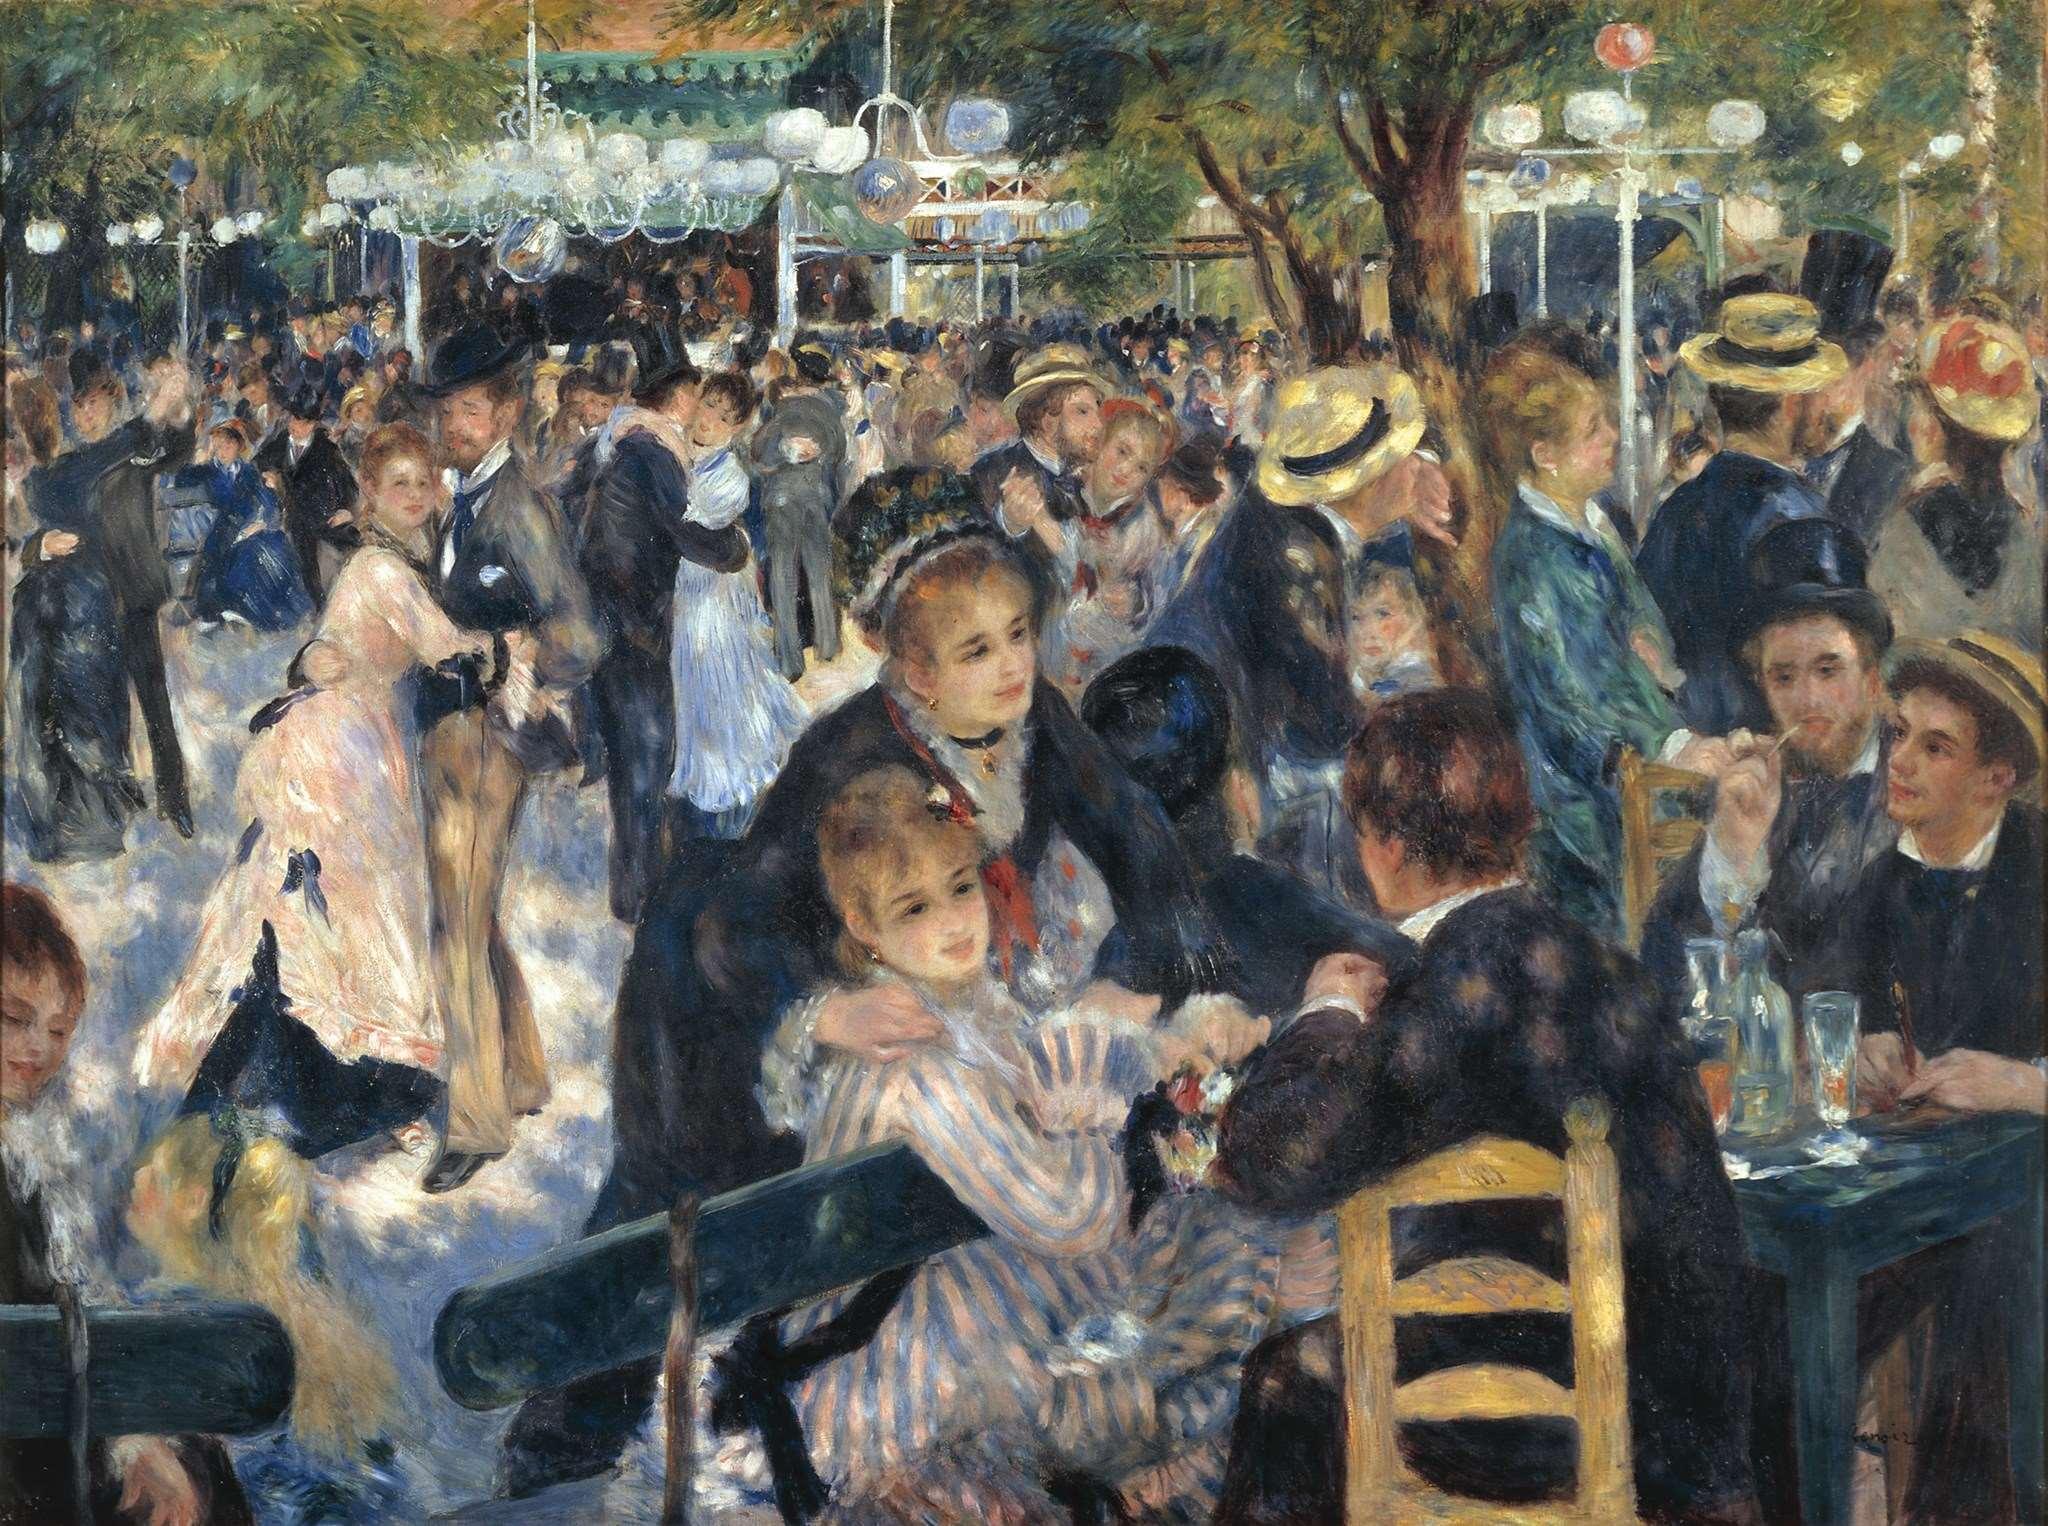 'Ball al Moulin de la Galette', de Pierre-Auguste Renoir